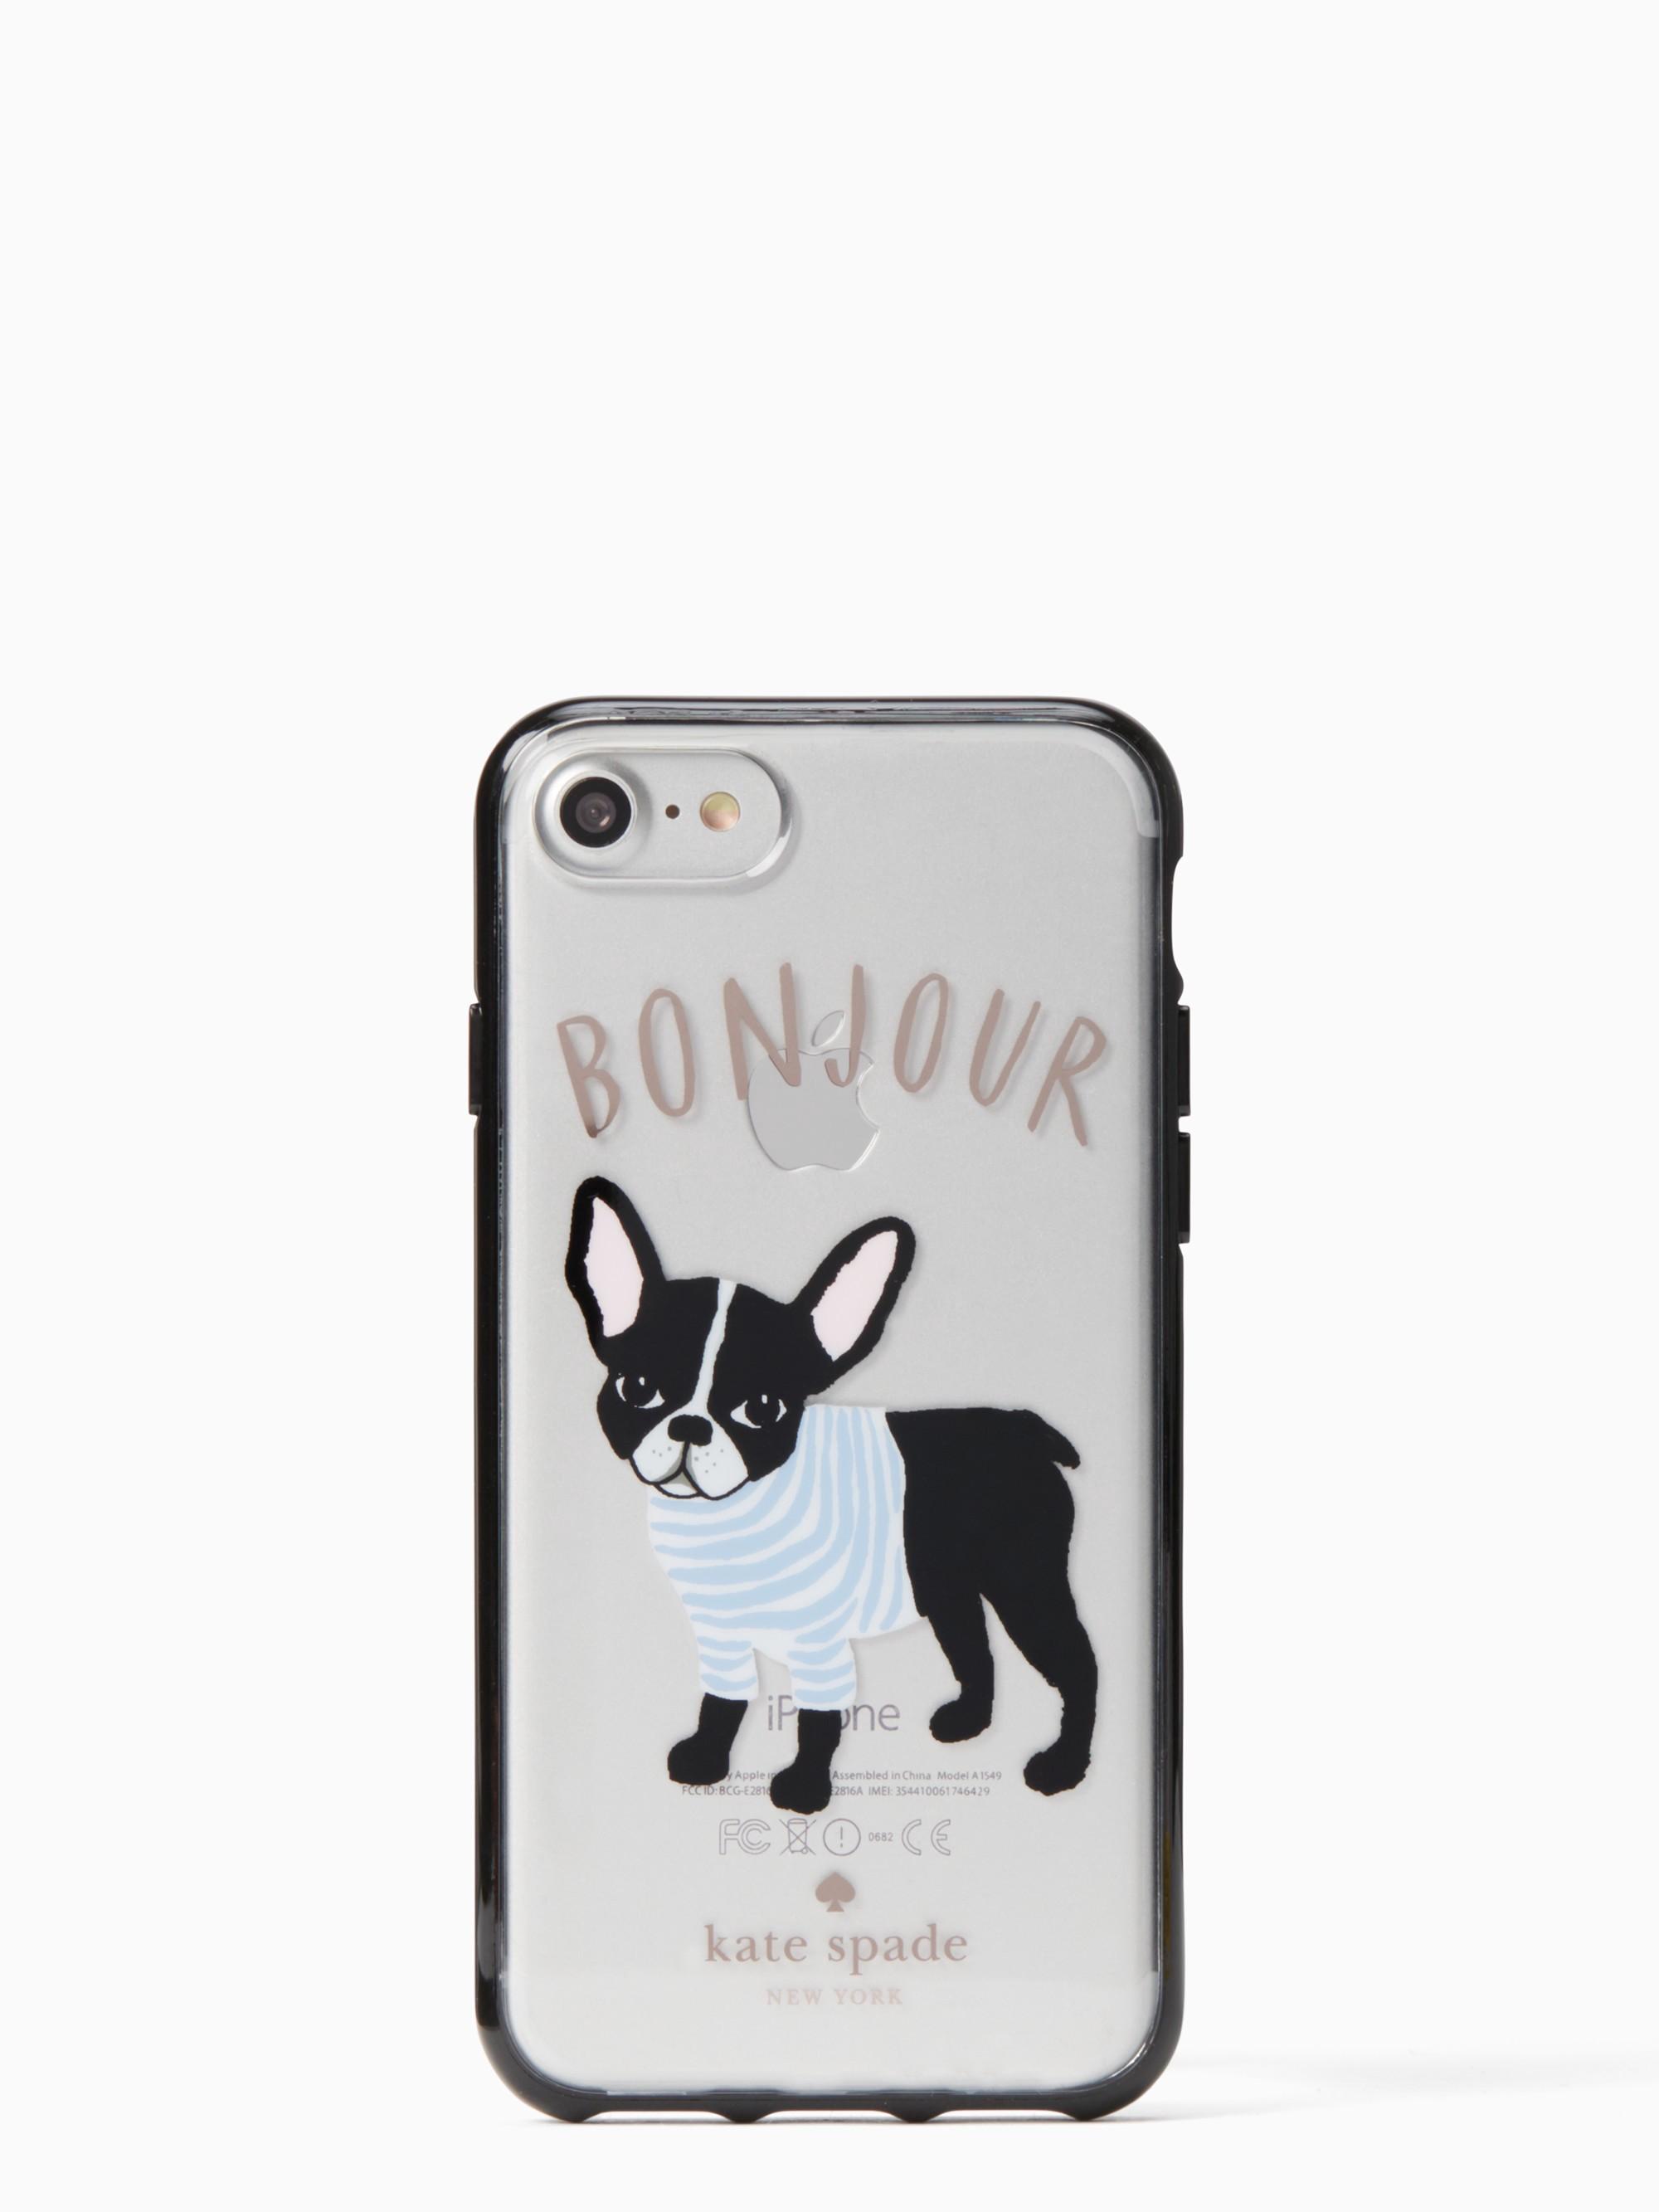 Kate Spade Bonjour Antoine Iphone 7 8 Case - Clear Multi  64cce4689b4ff